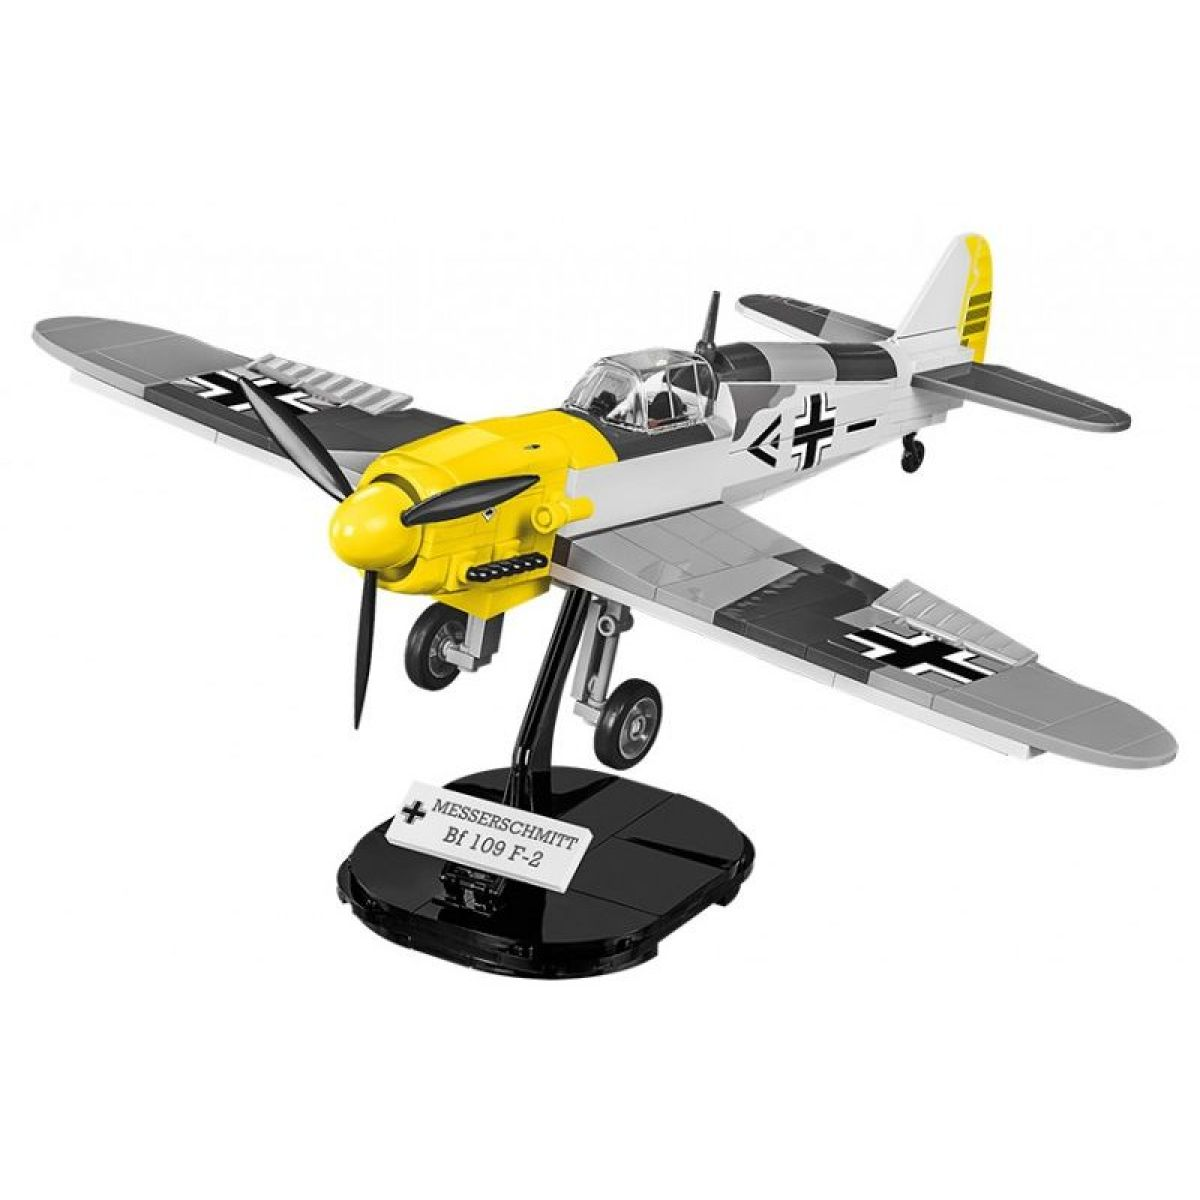 Cobi 5715 II. světová válka Messerschmitt BF 109